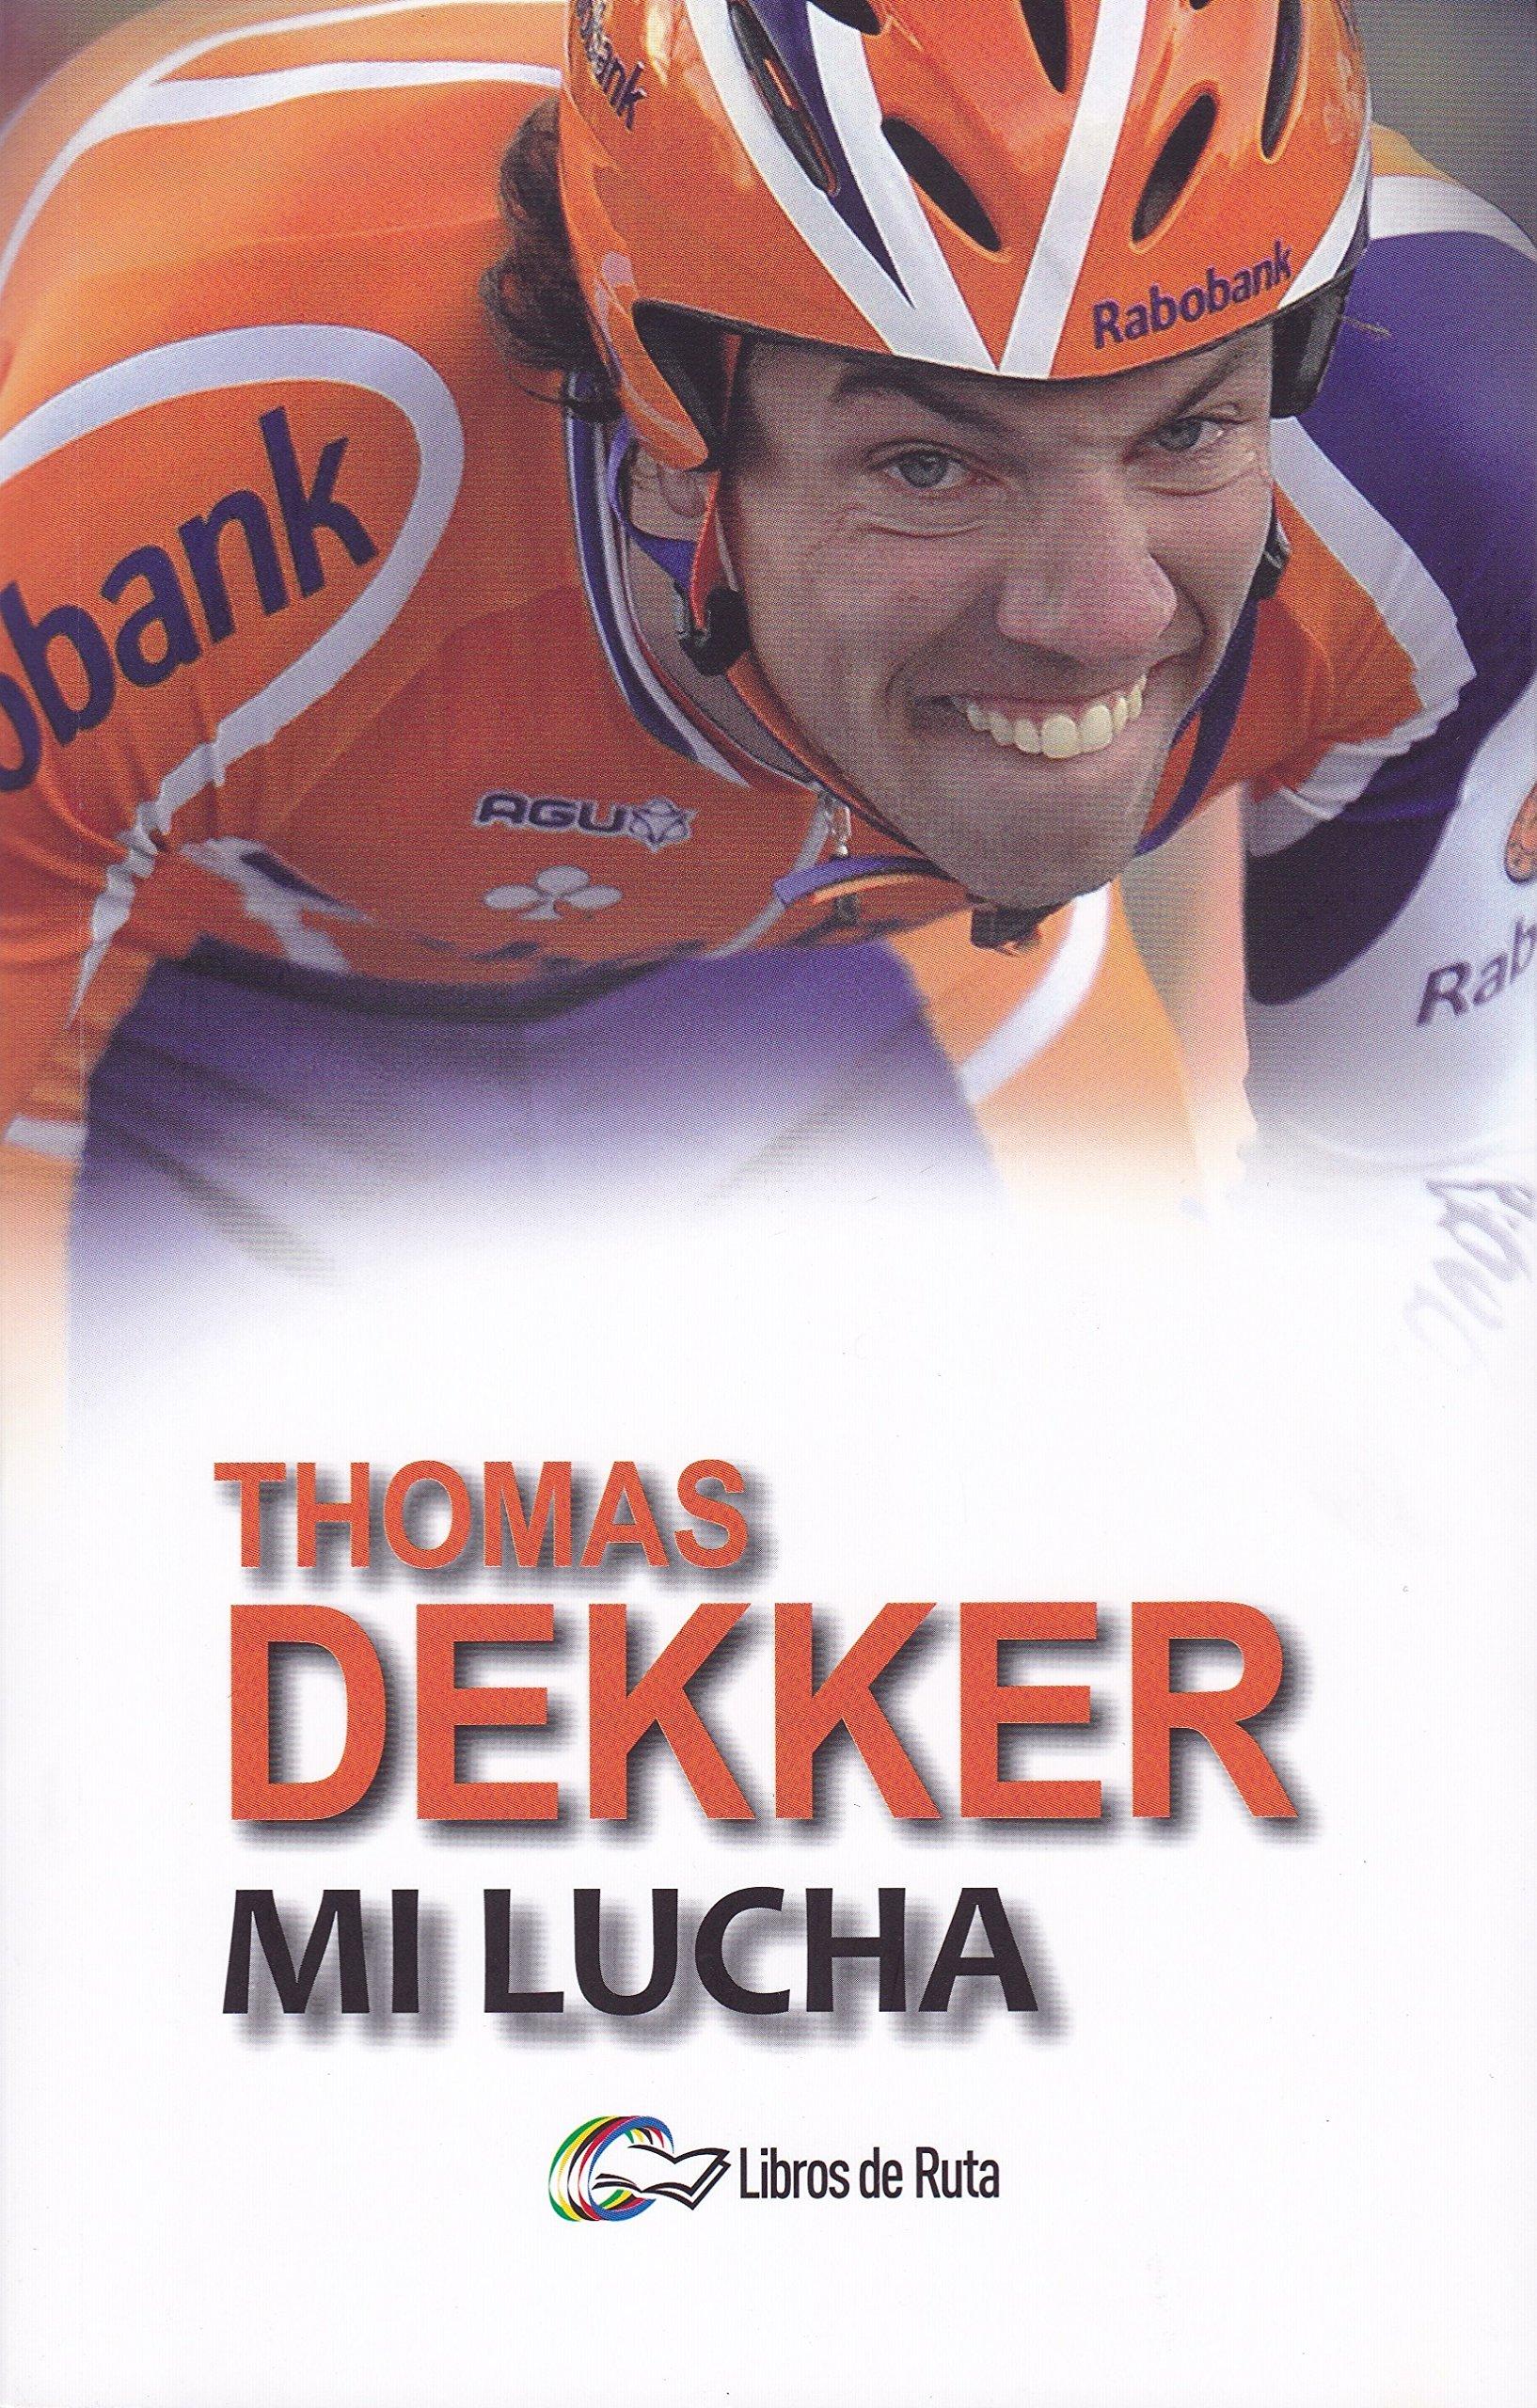 A1uOqpz7MXL - Libros de Ciclismo